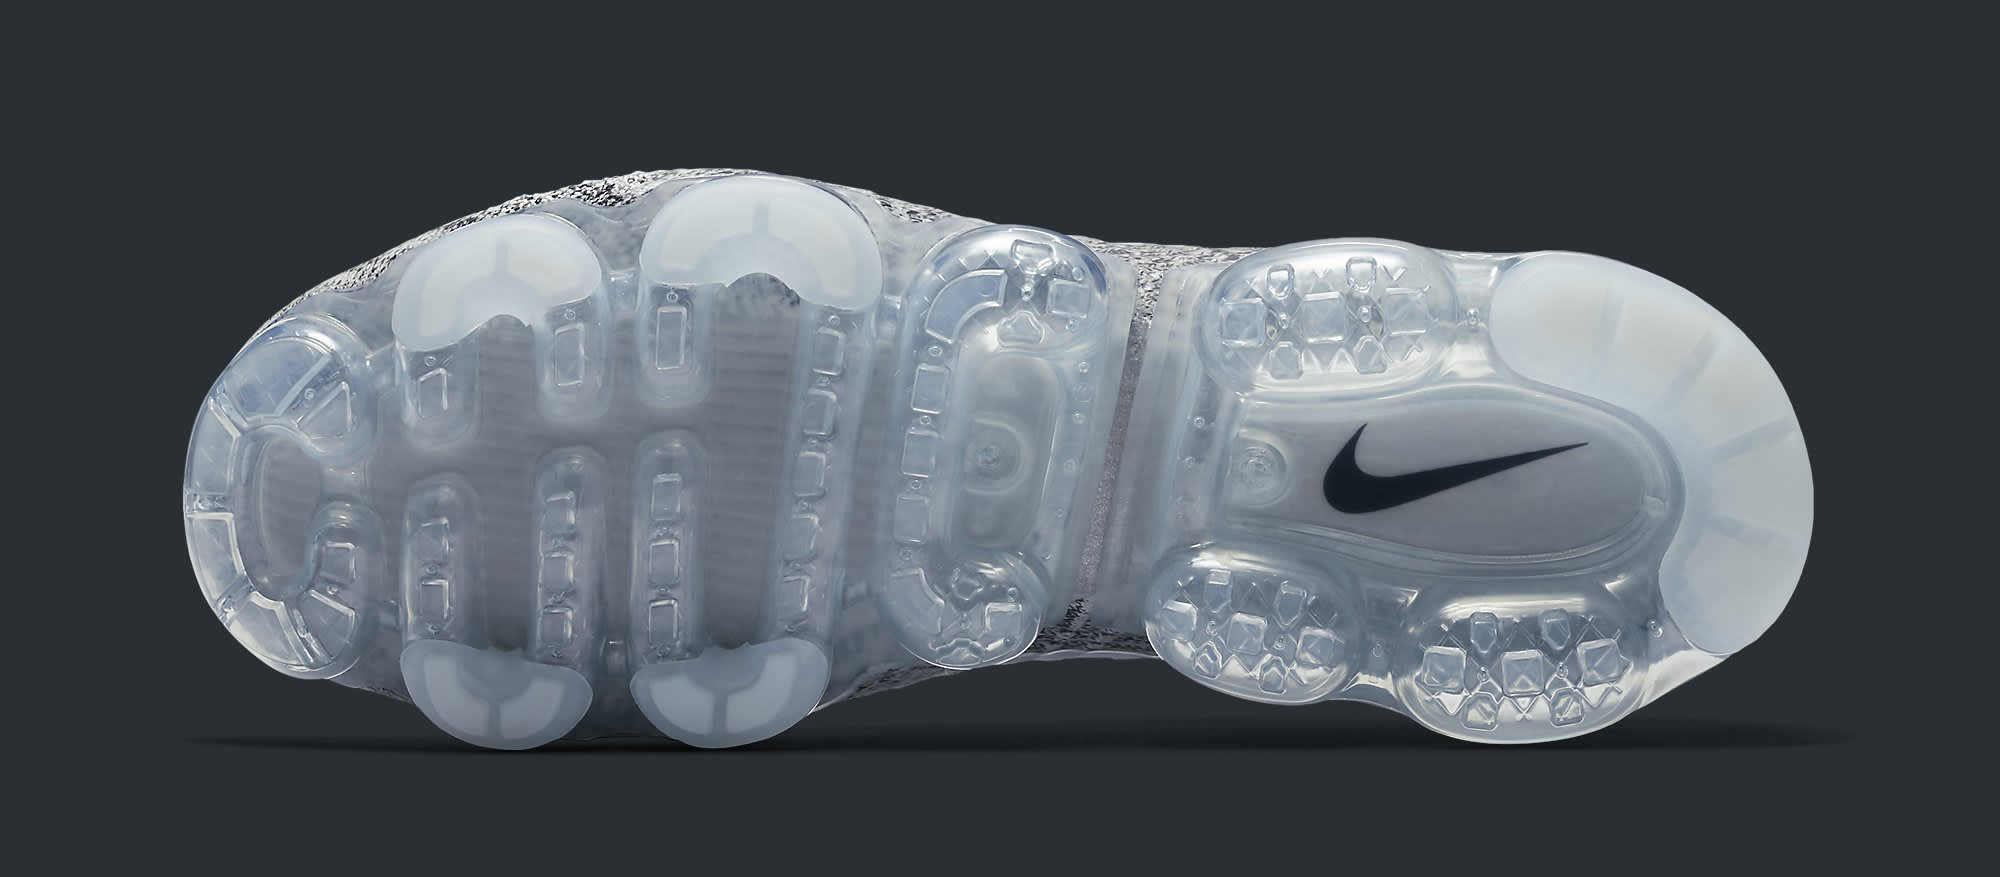 Women's Nike Air VaporMax 'Black/Anthracite' Launching 29th June